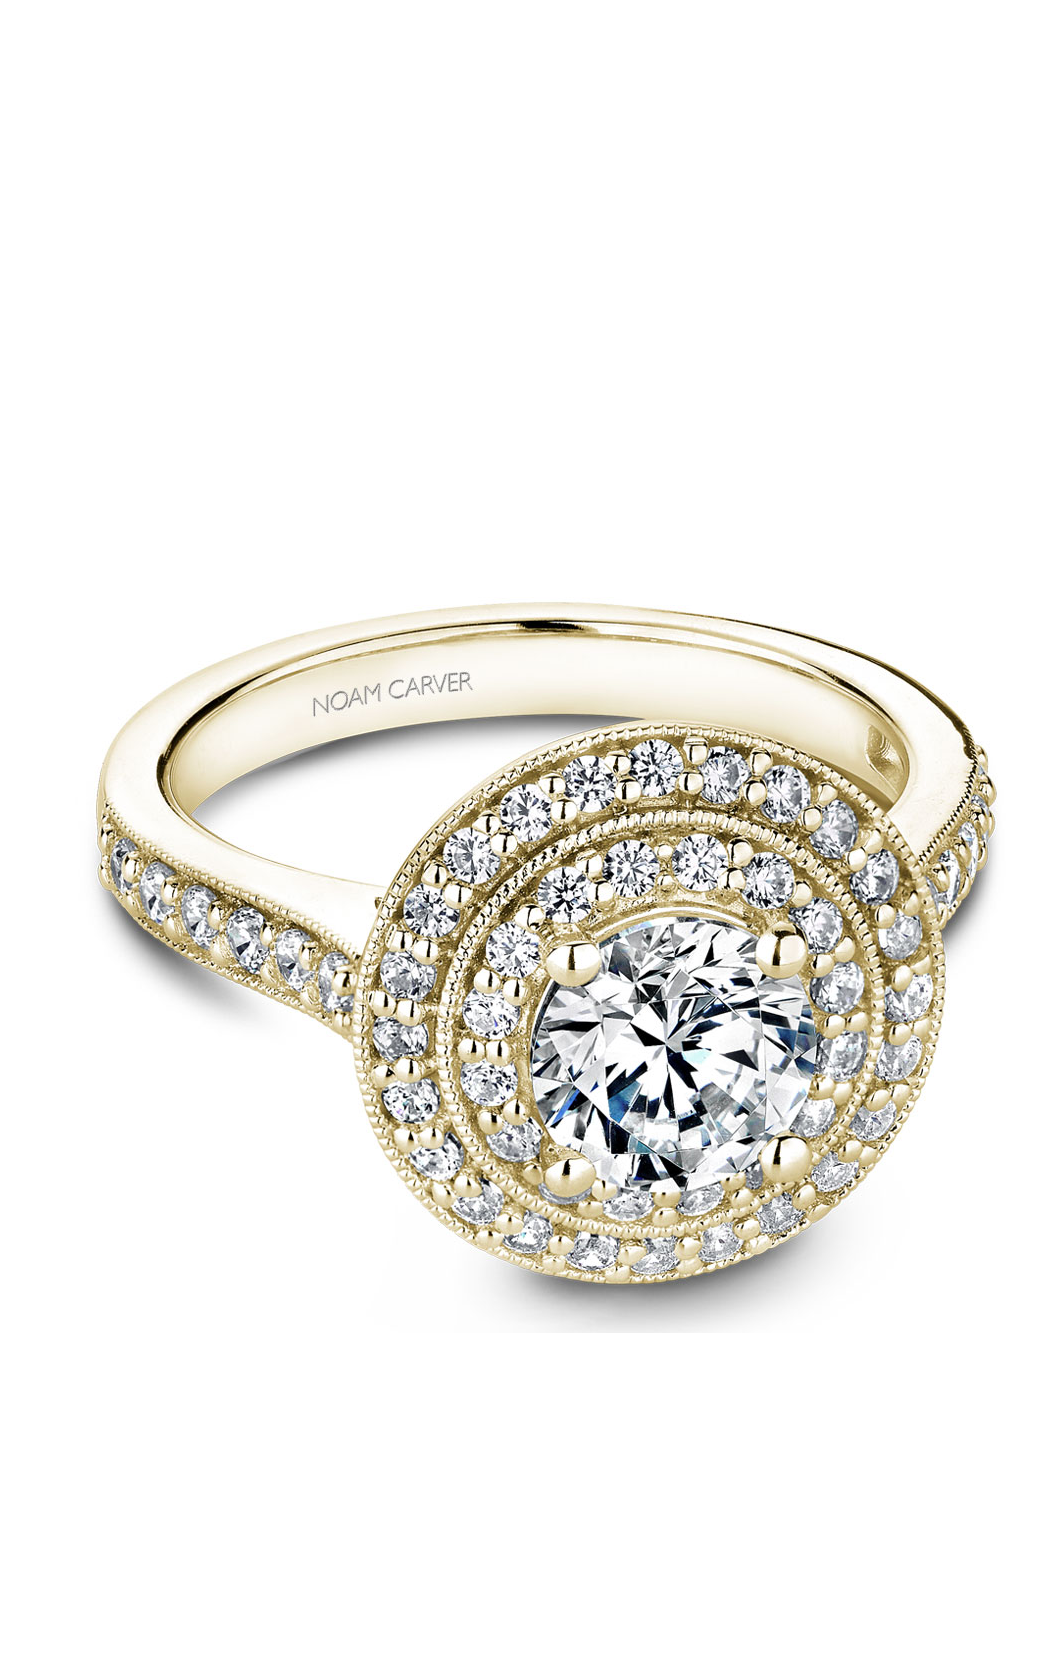 Noam Carver Halo Engagement Ring B183-01YM product image